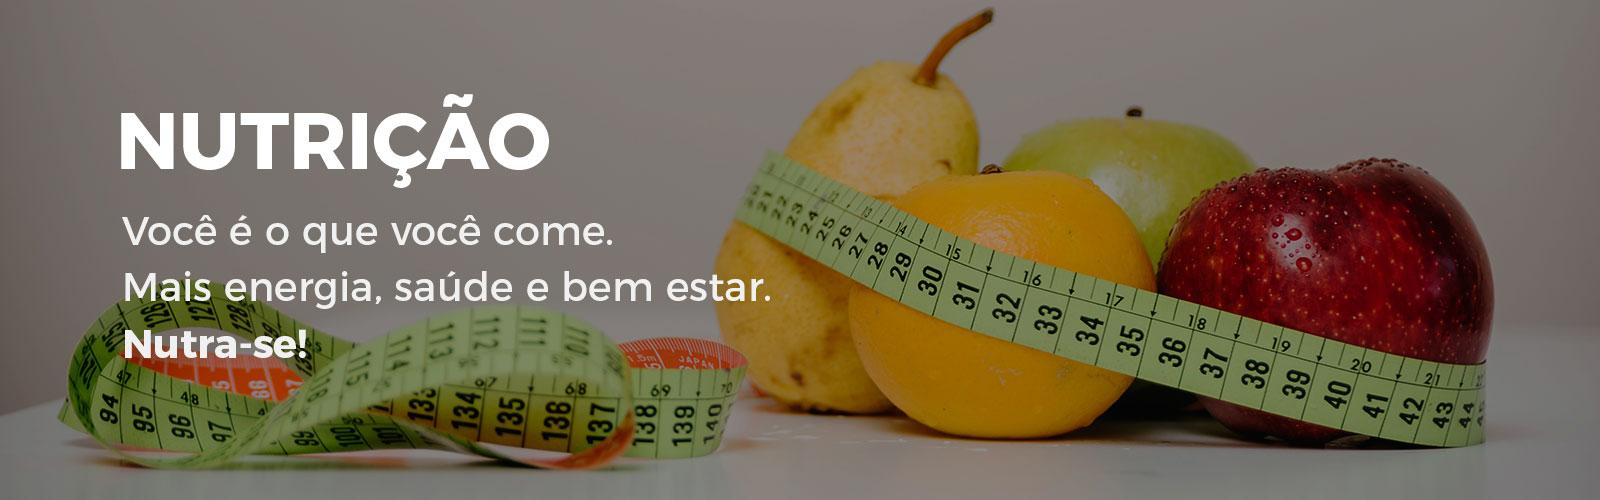 https://belaclin.com.br/nutricao